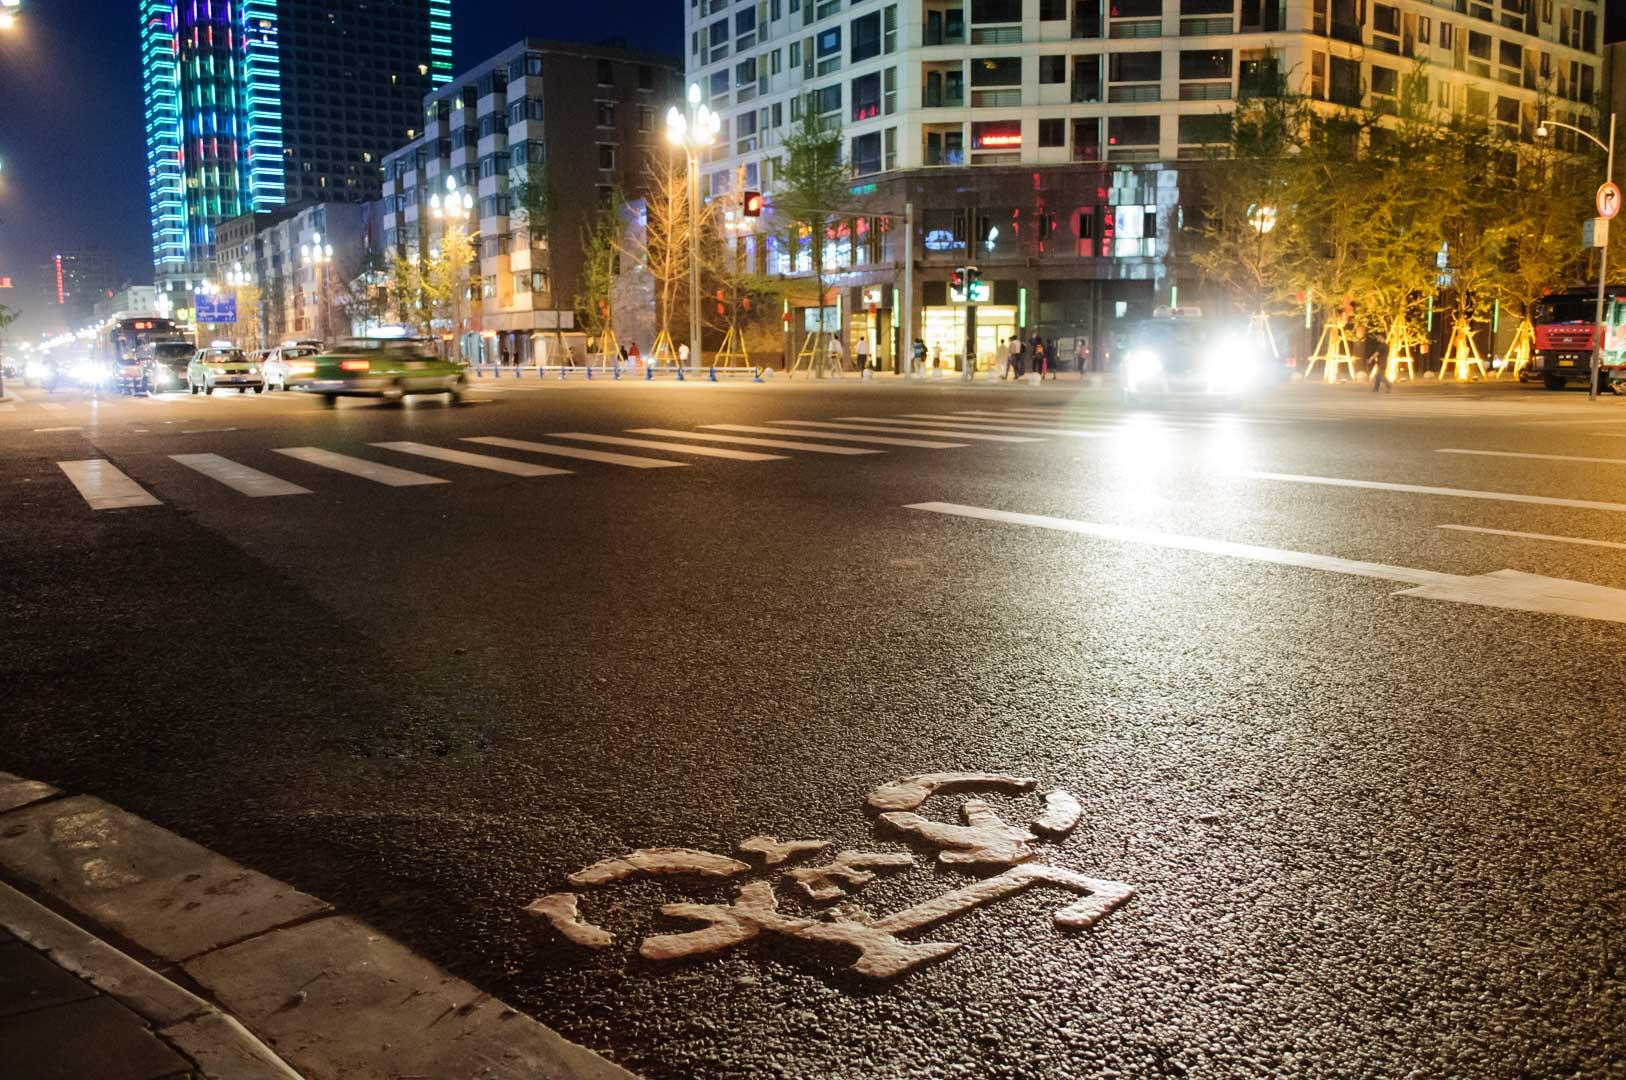 A bike path in Chengdu, China